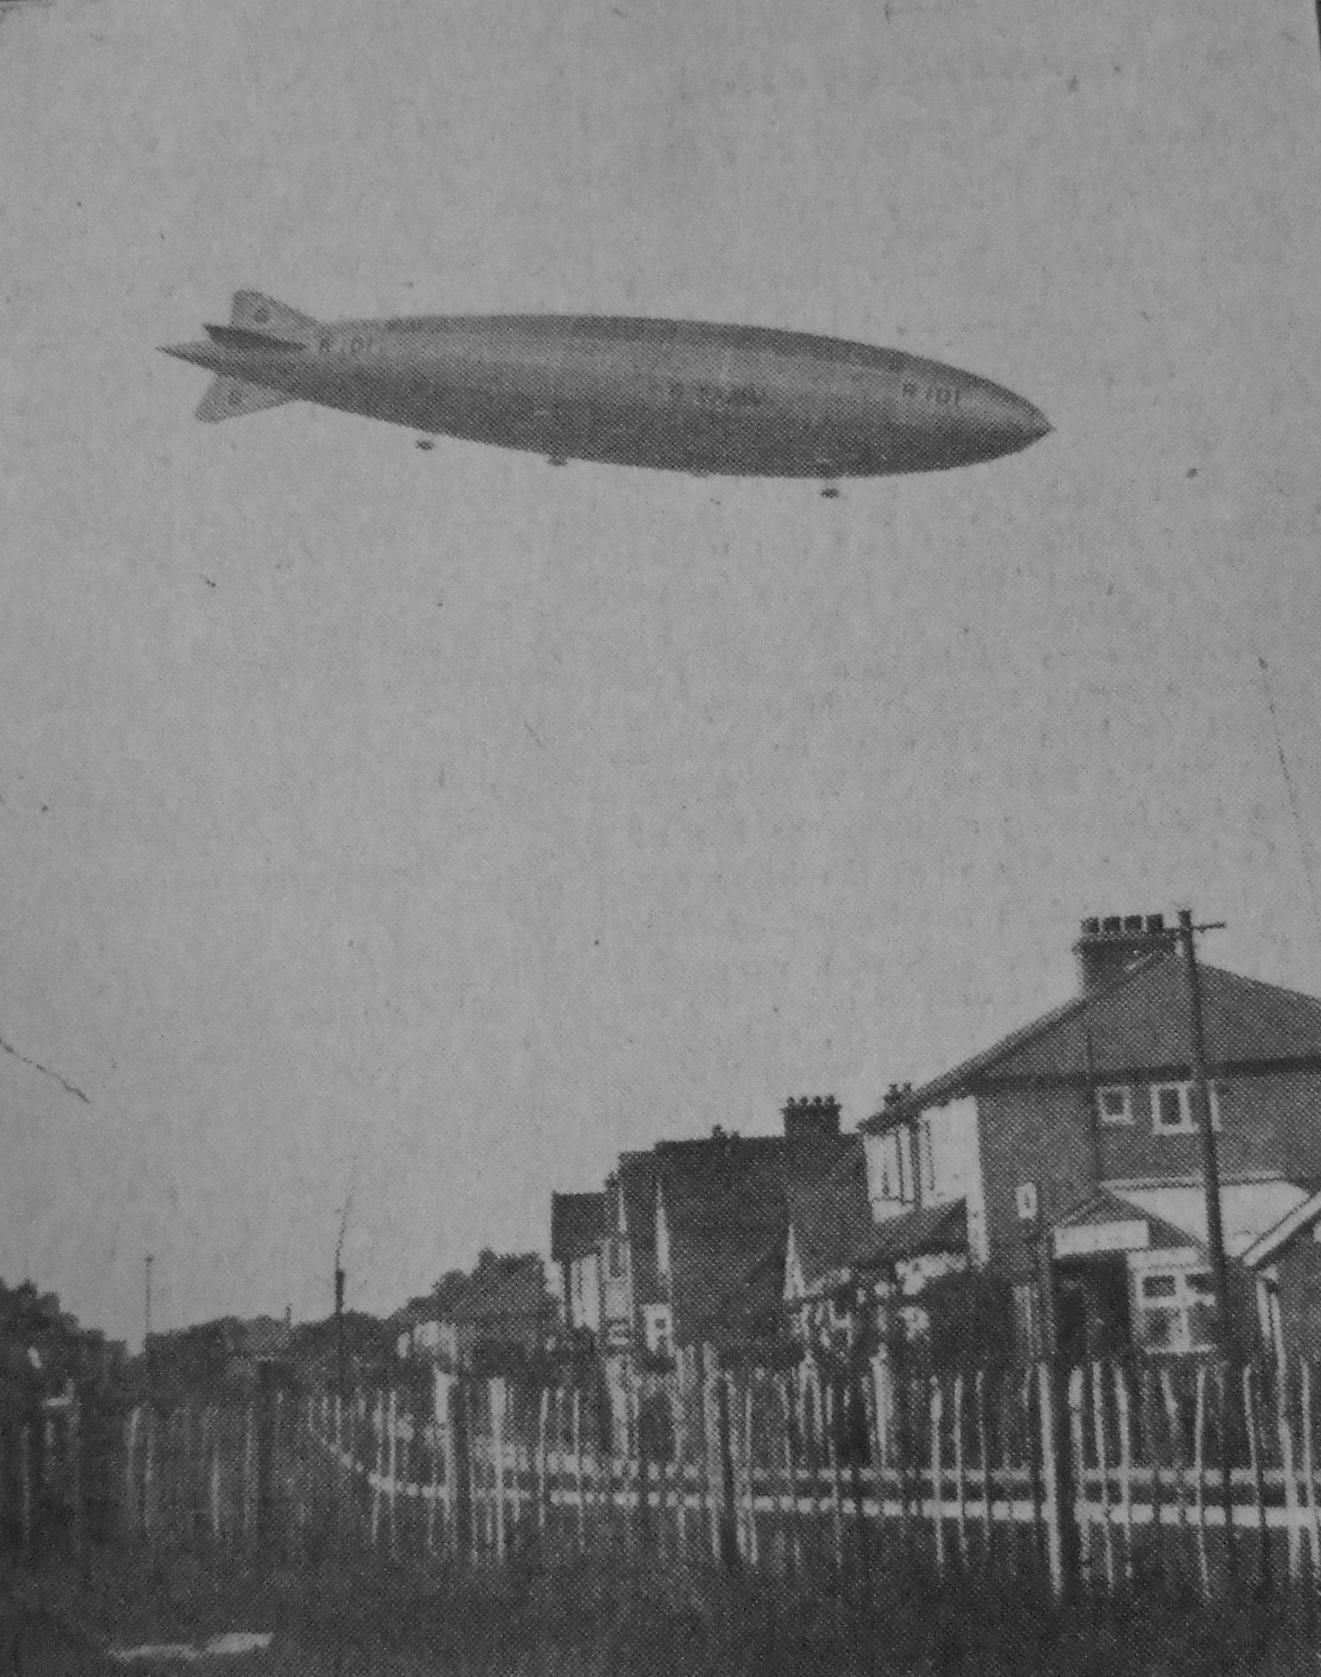 The R101 Airship Passes Hillmorton, Bilton and Wolston - Our ...